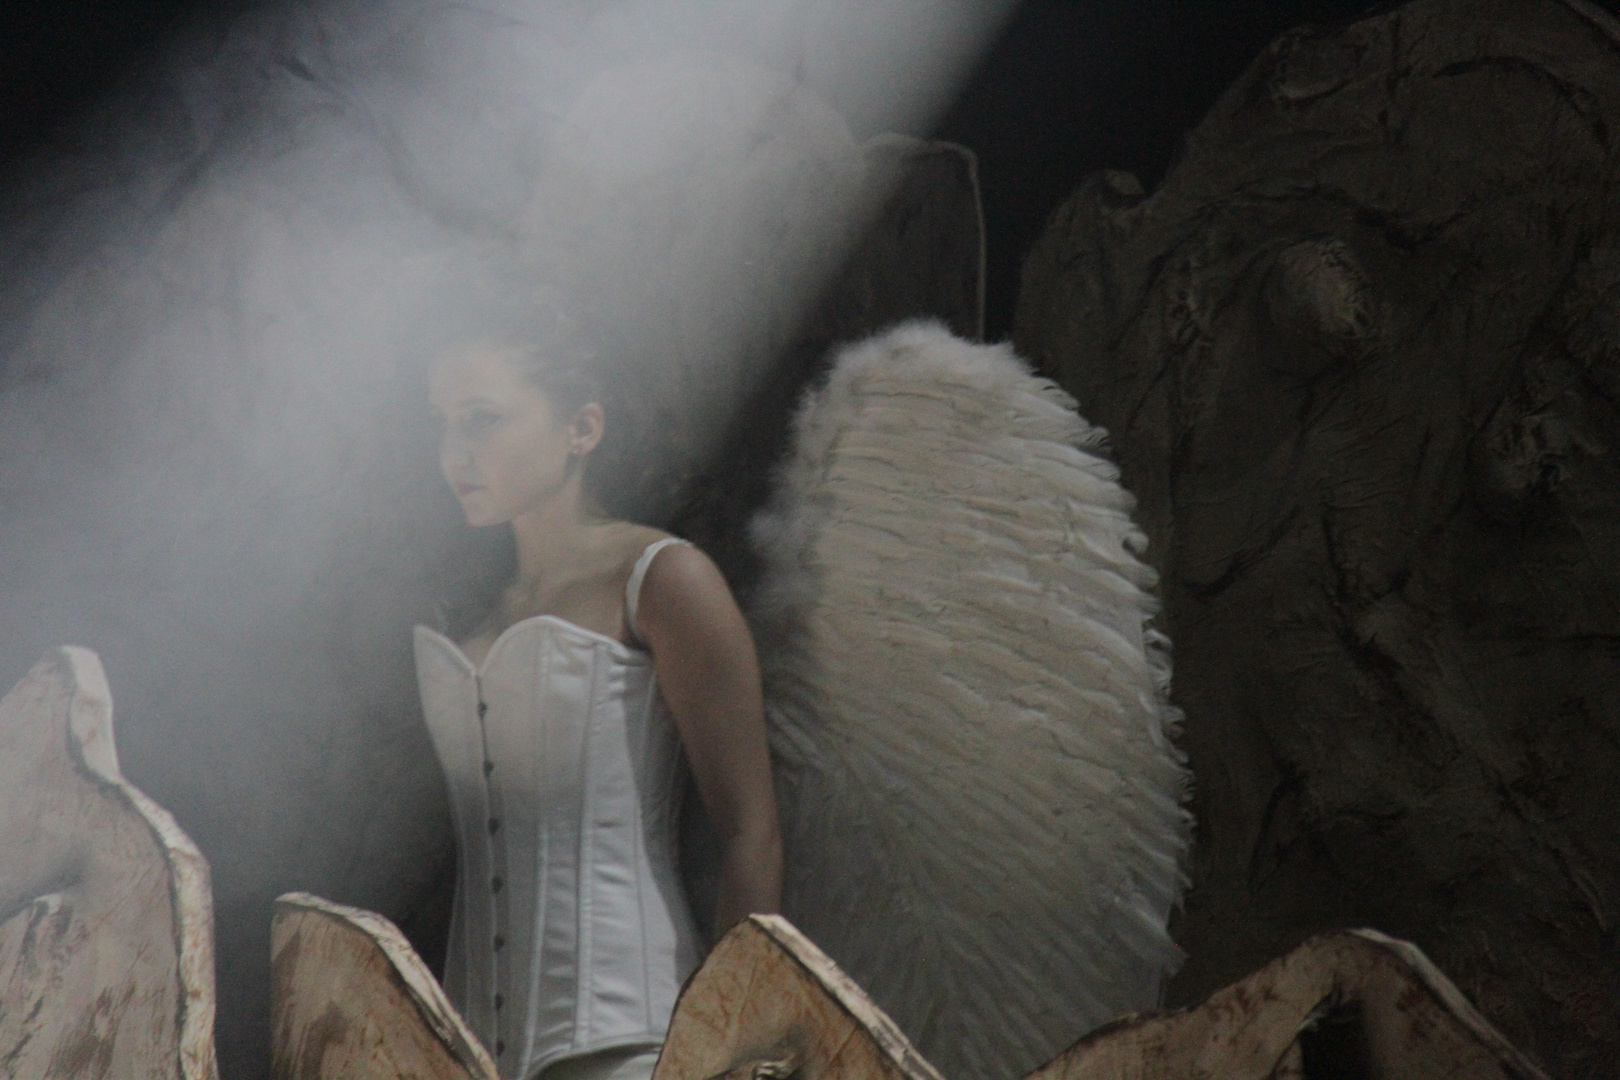 Engel aus dem Musical die 10 Gebote (Baesweiler)